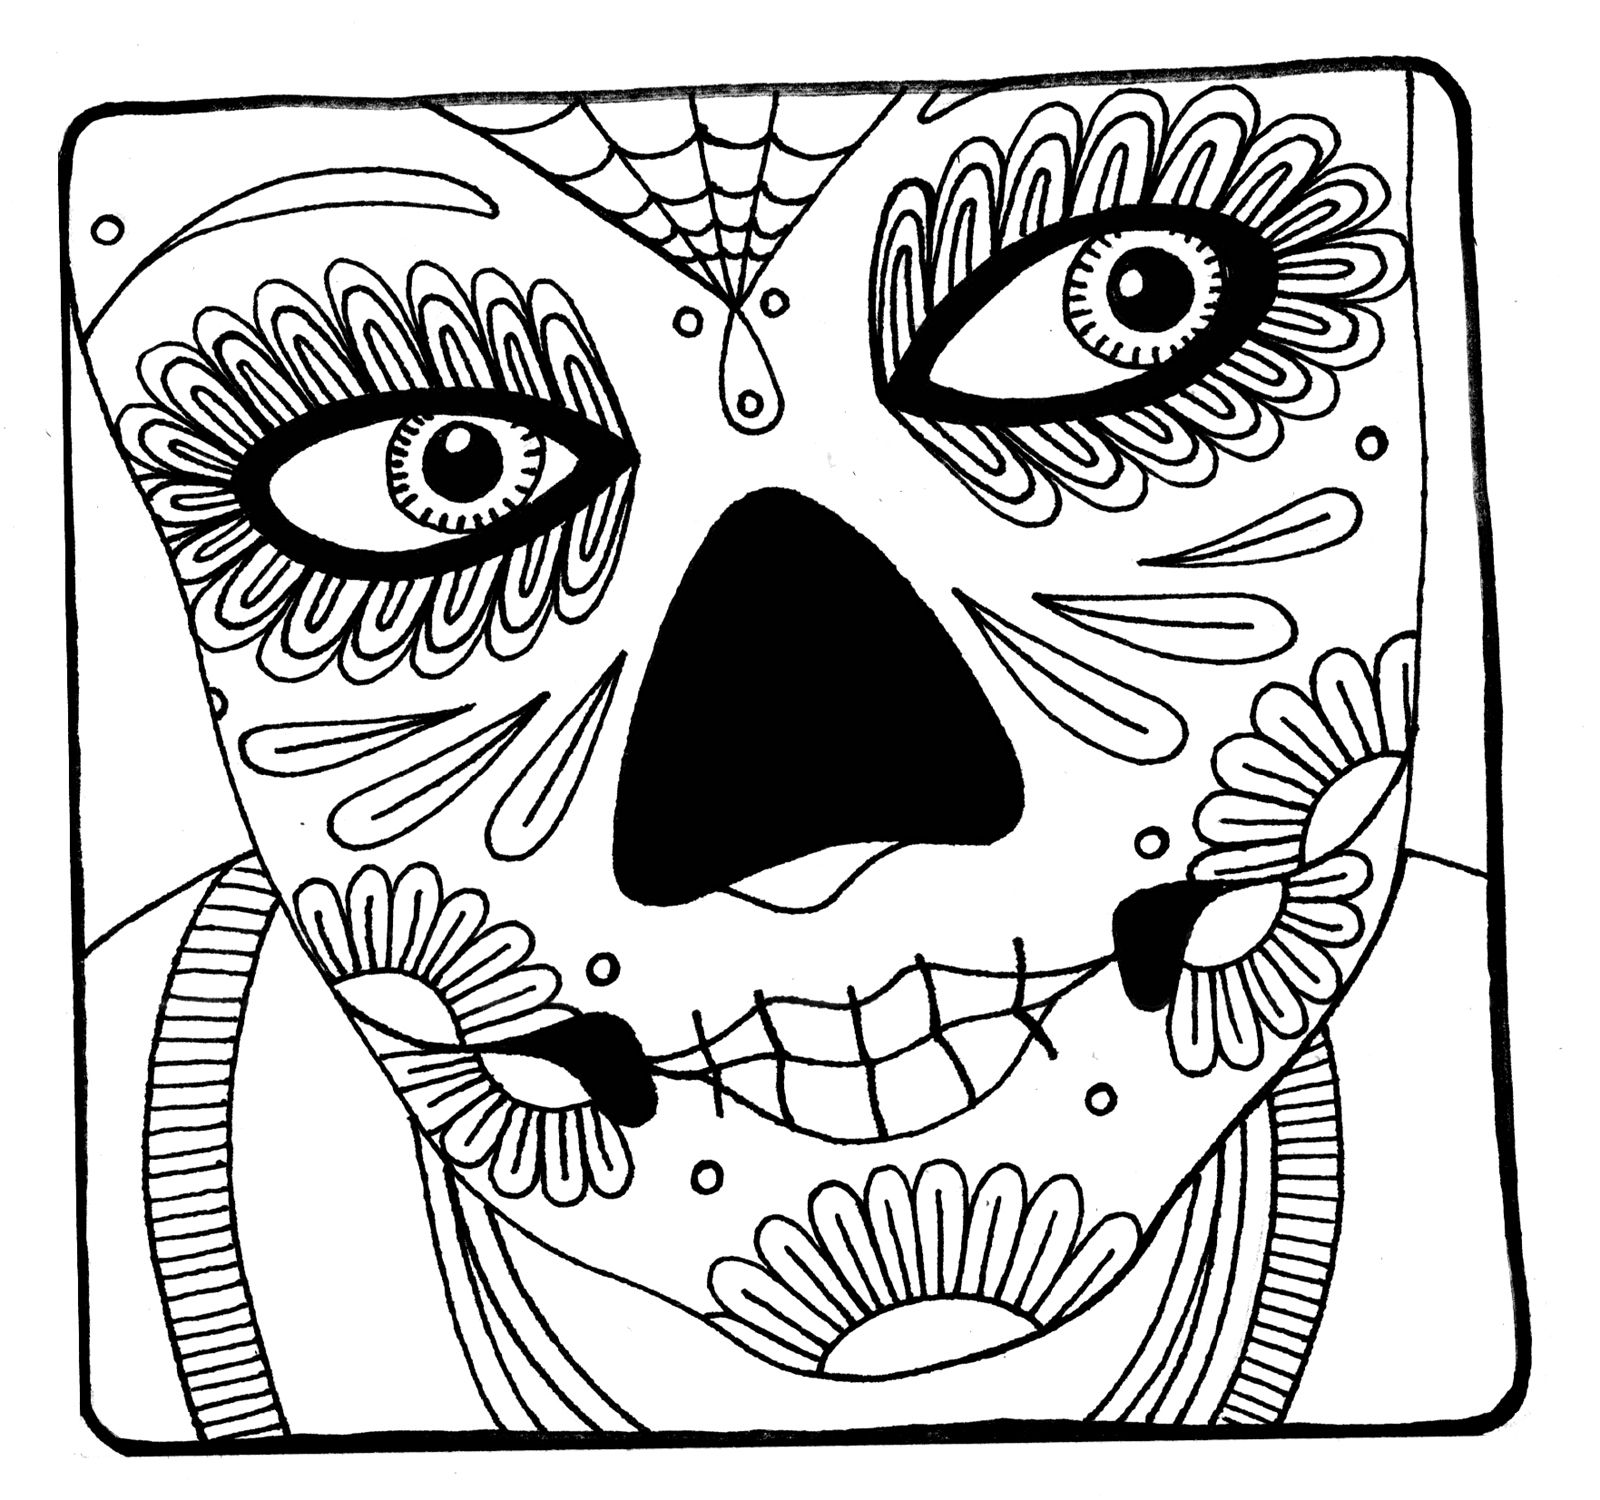 Coloring pictures skulls - Halloween Printable Dia De Los Muertos Sugar Skull Coloring Page Could Be A Cute Tattoo